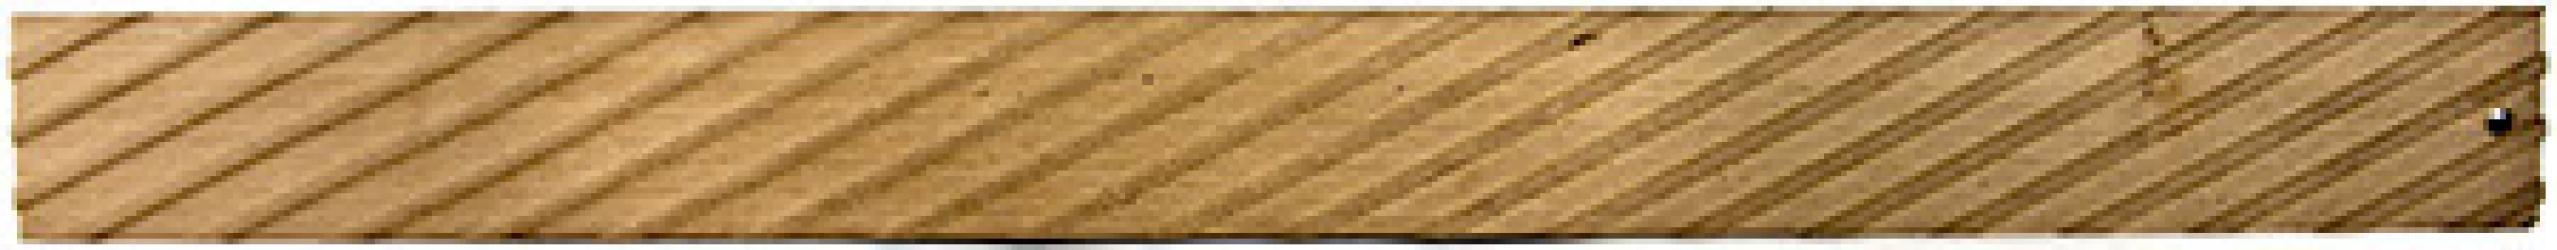 BeerStix - Medium Plus Toast French Oak Tank Stave (60 gal)